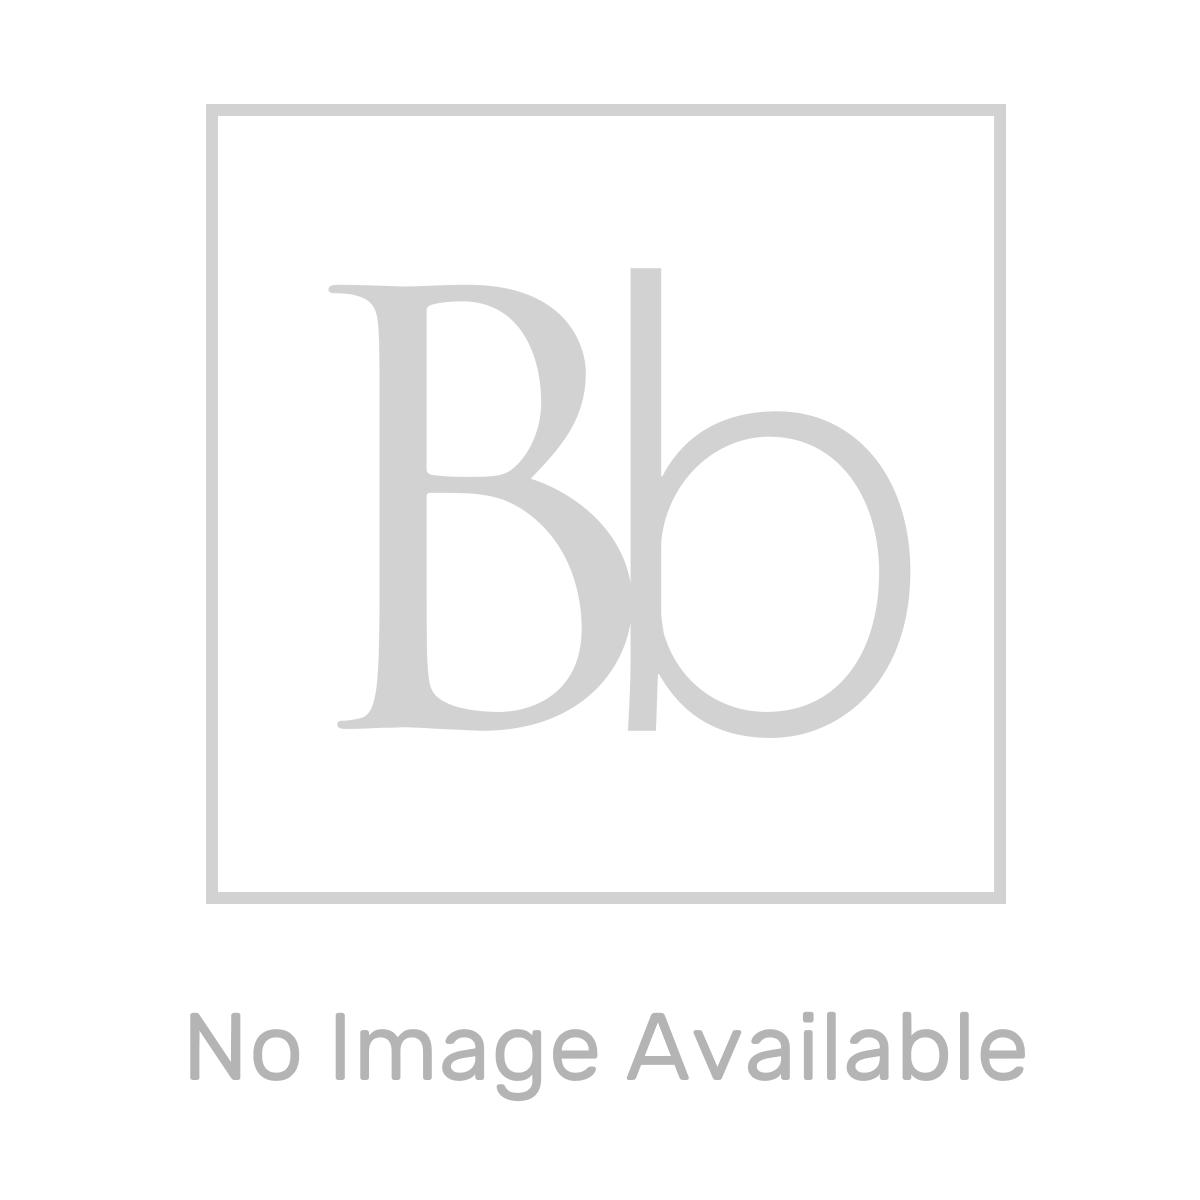 HiB Vortex Large Landscape LED Back-Lit Bathroom Mirror